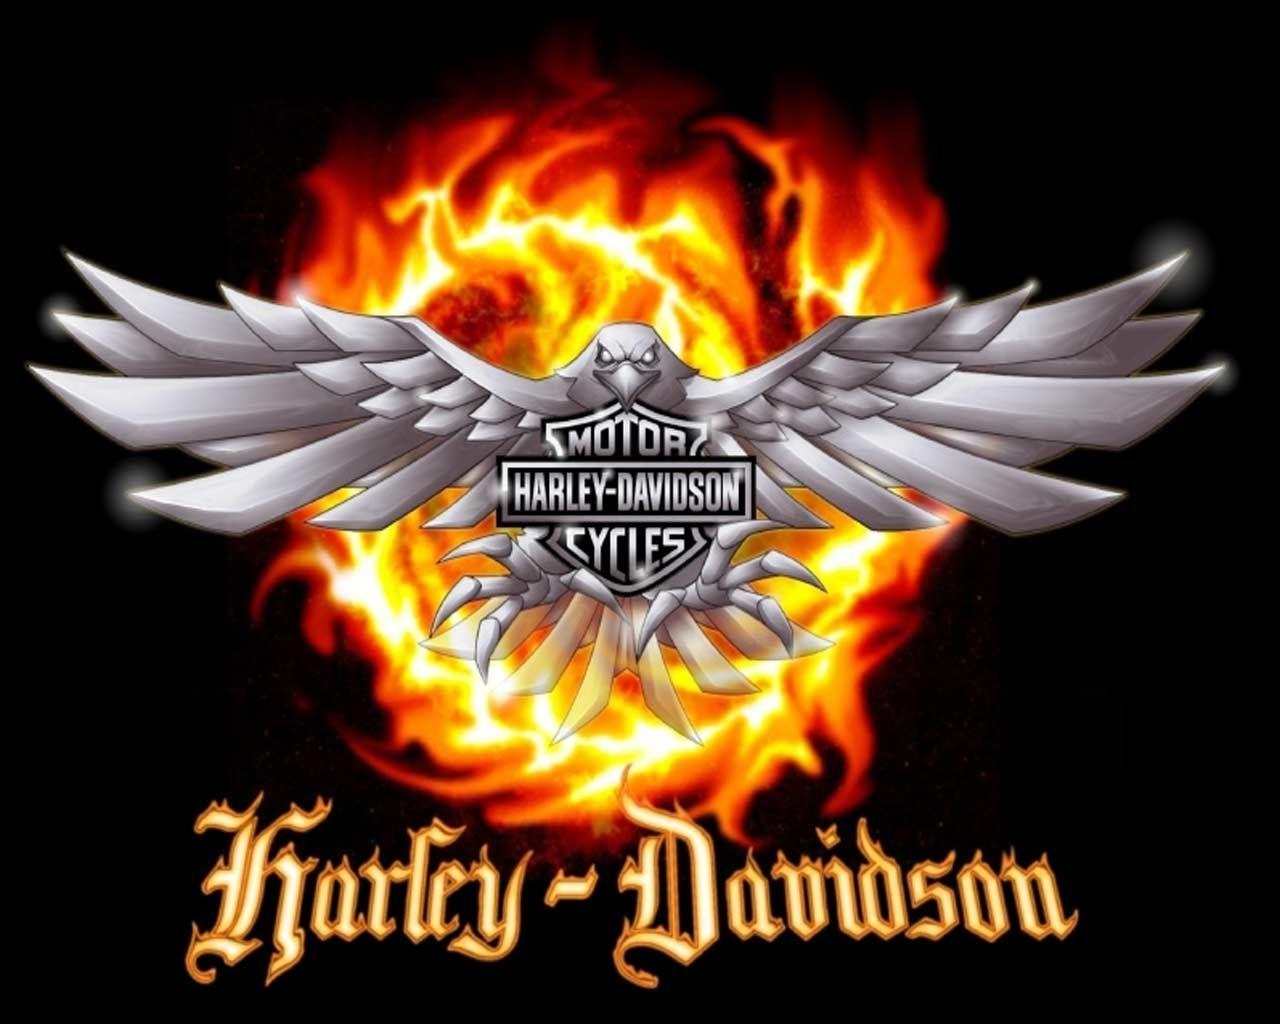 harley-davidson logo wallpaper | harley-davidson logo | harley's